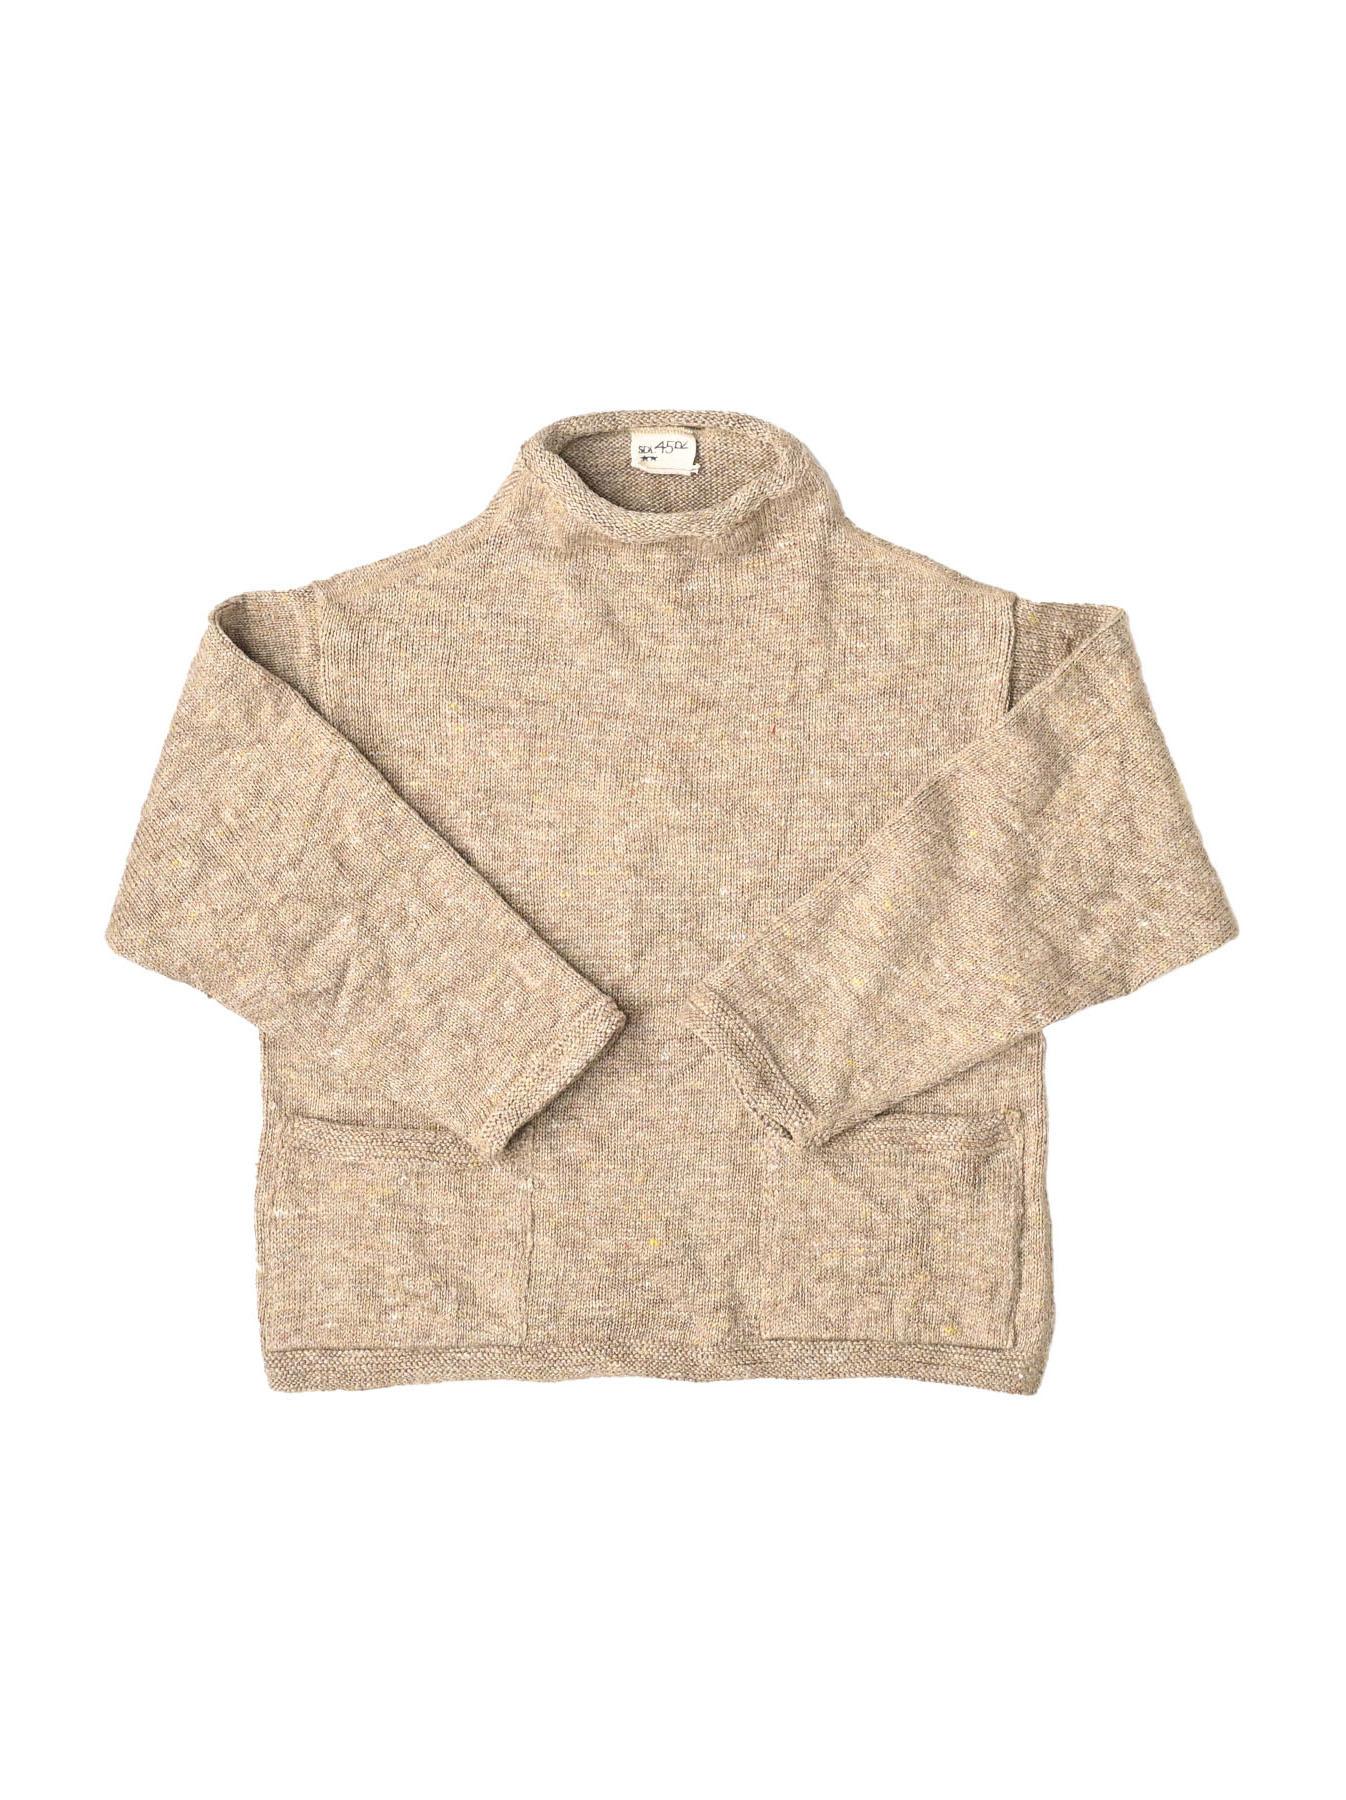 WH Linen Tweed Knit-sew 908 Umahiko Sweater (0321)-10